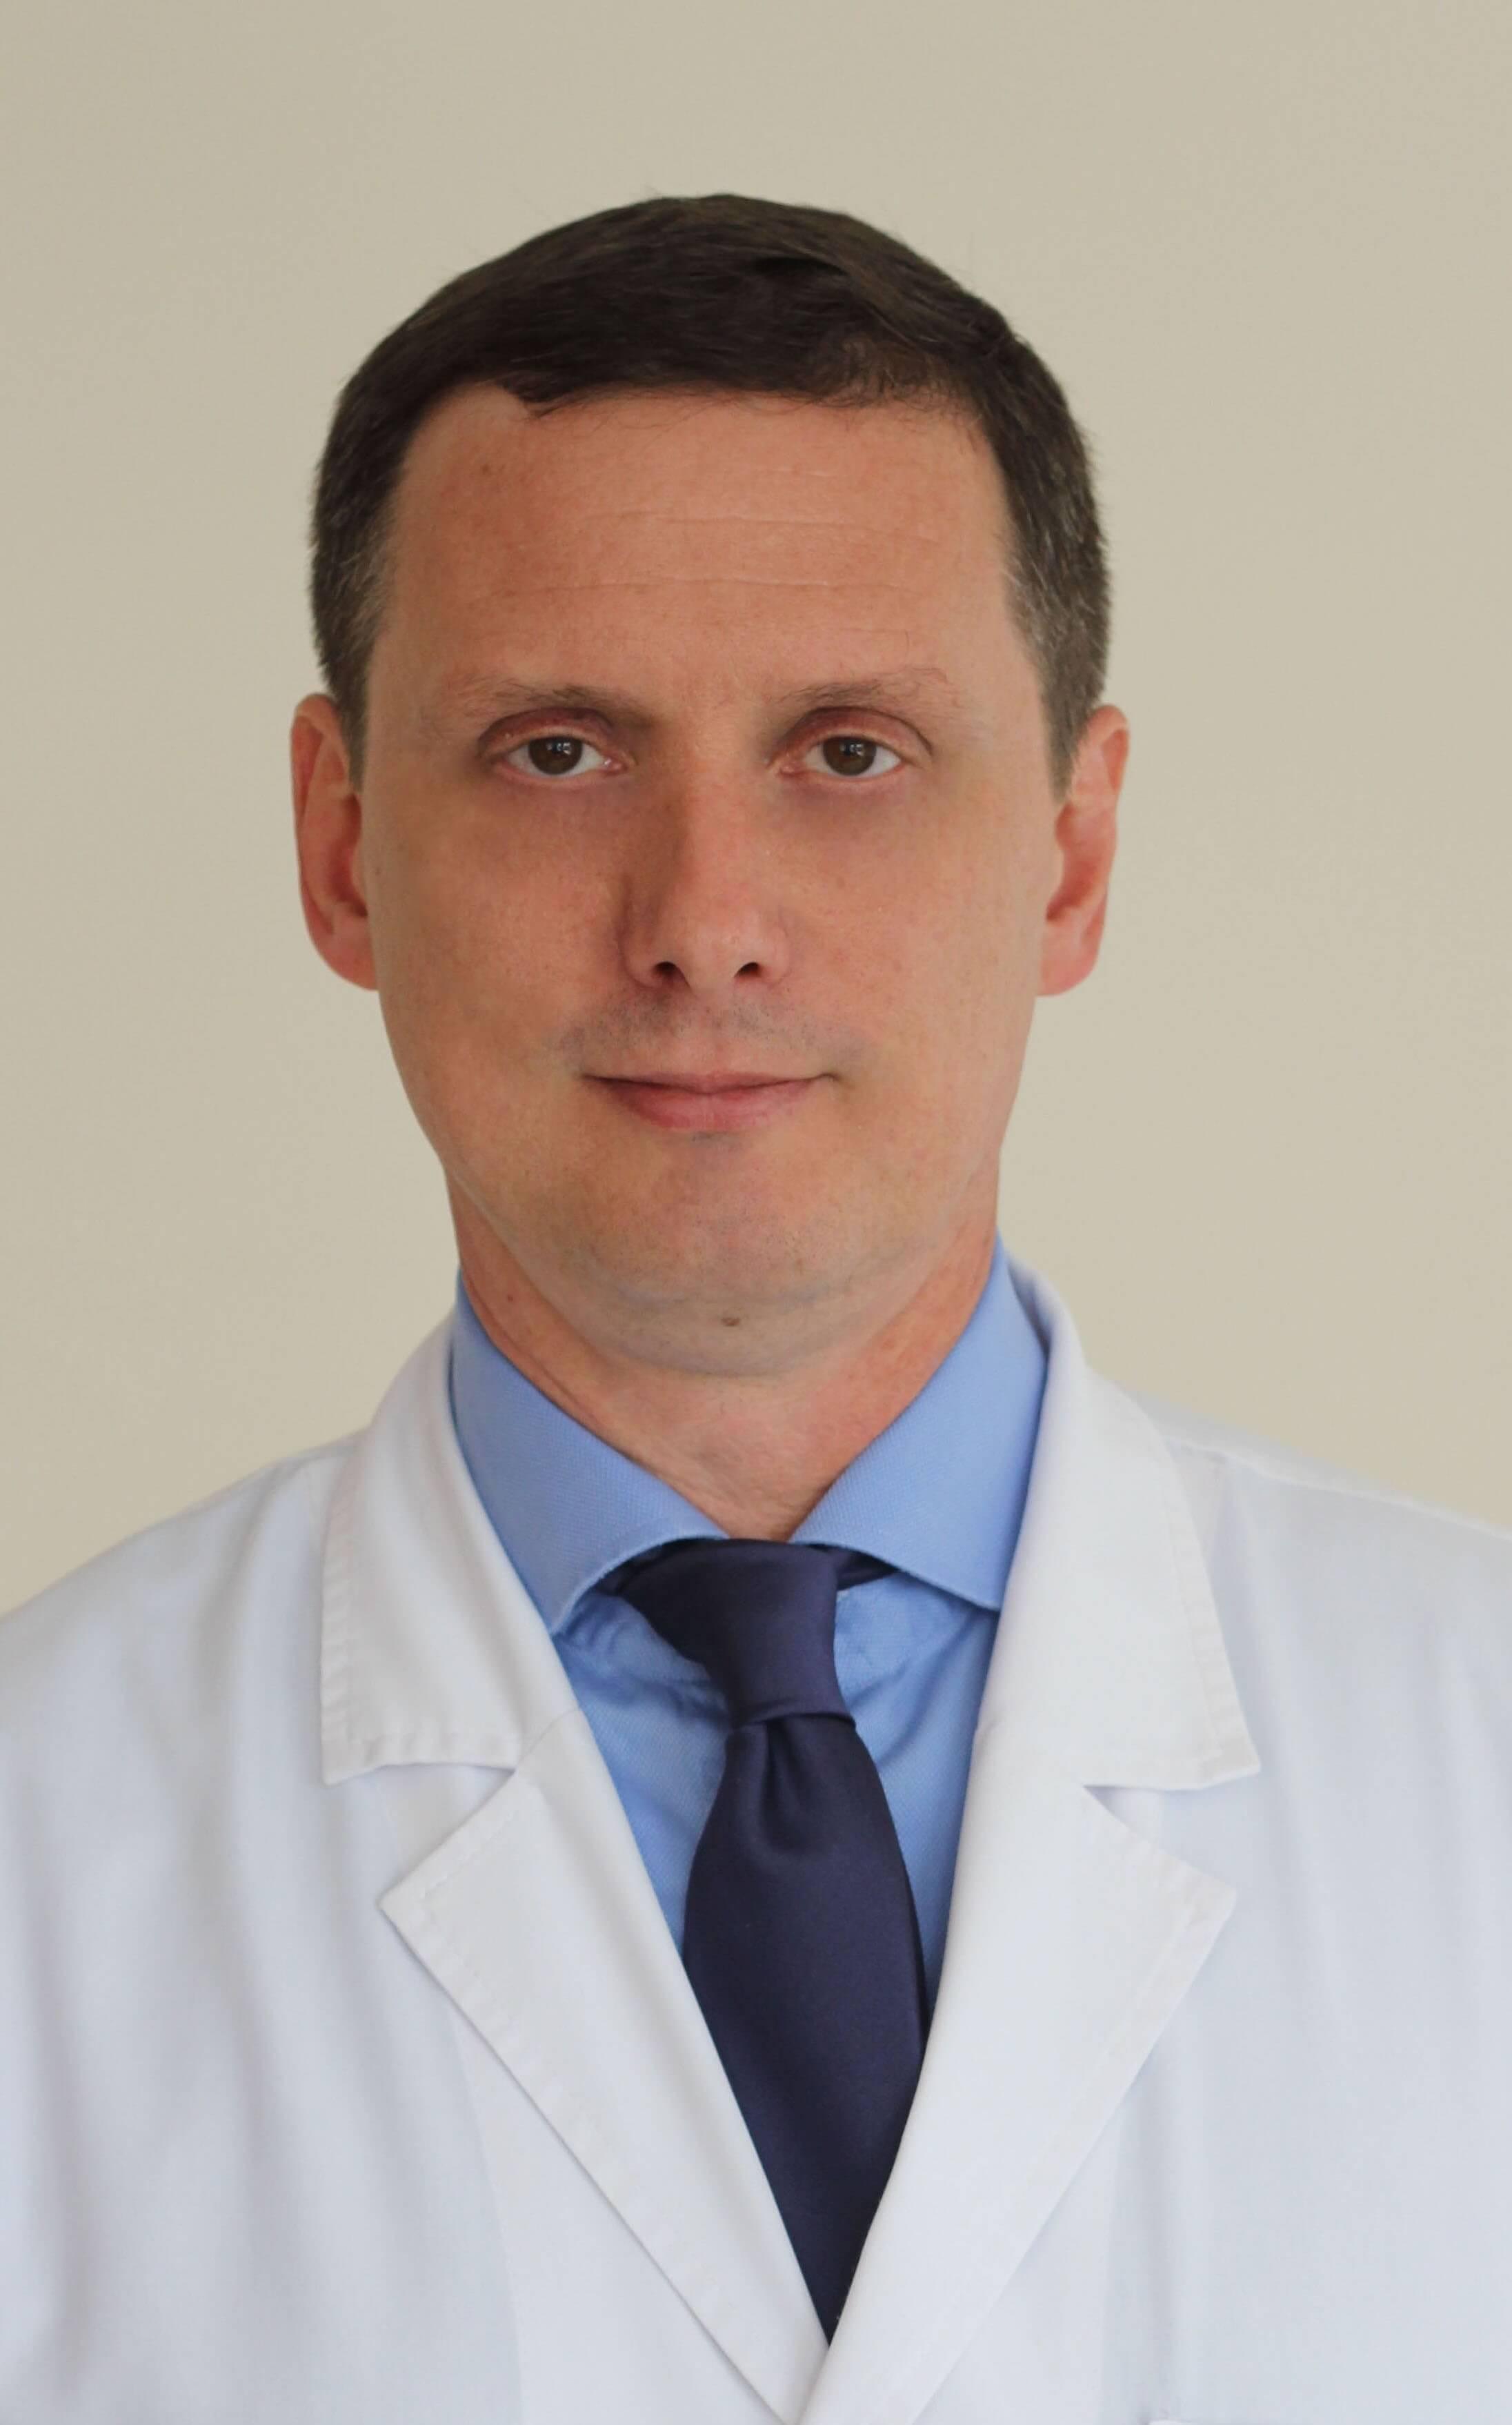 Никитин Алексей Эдуардович